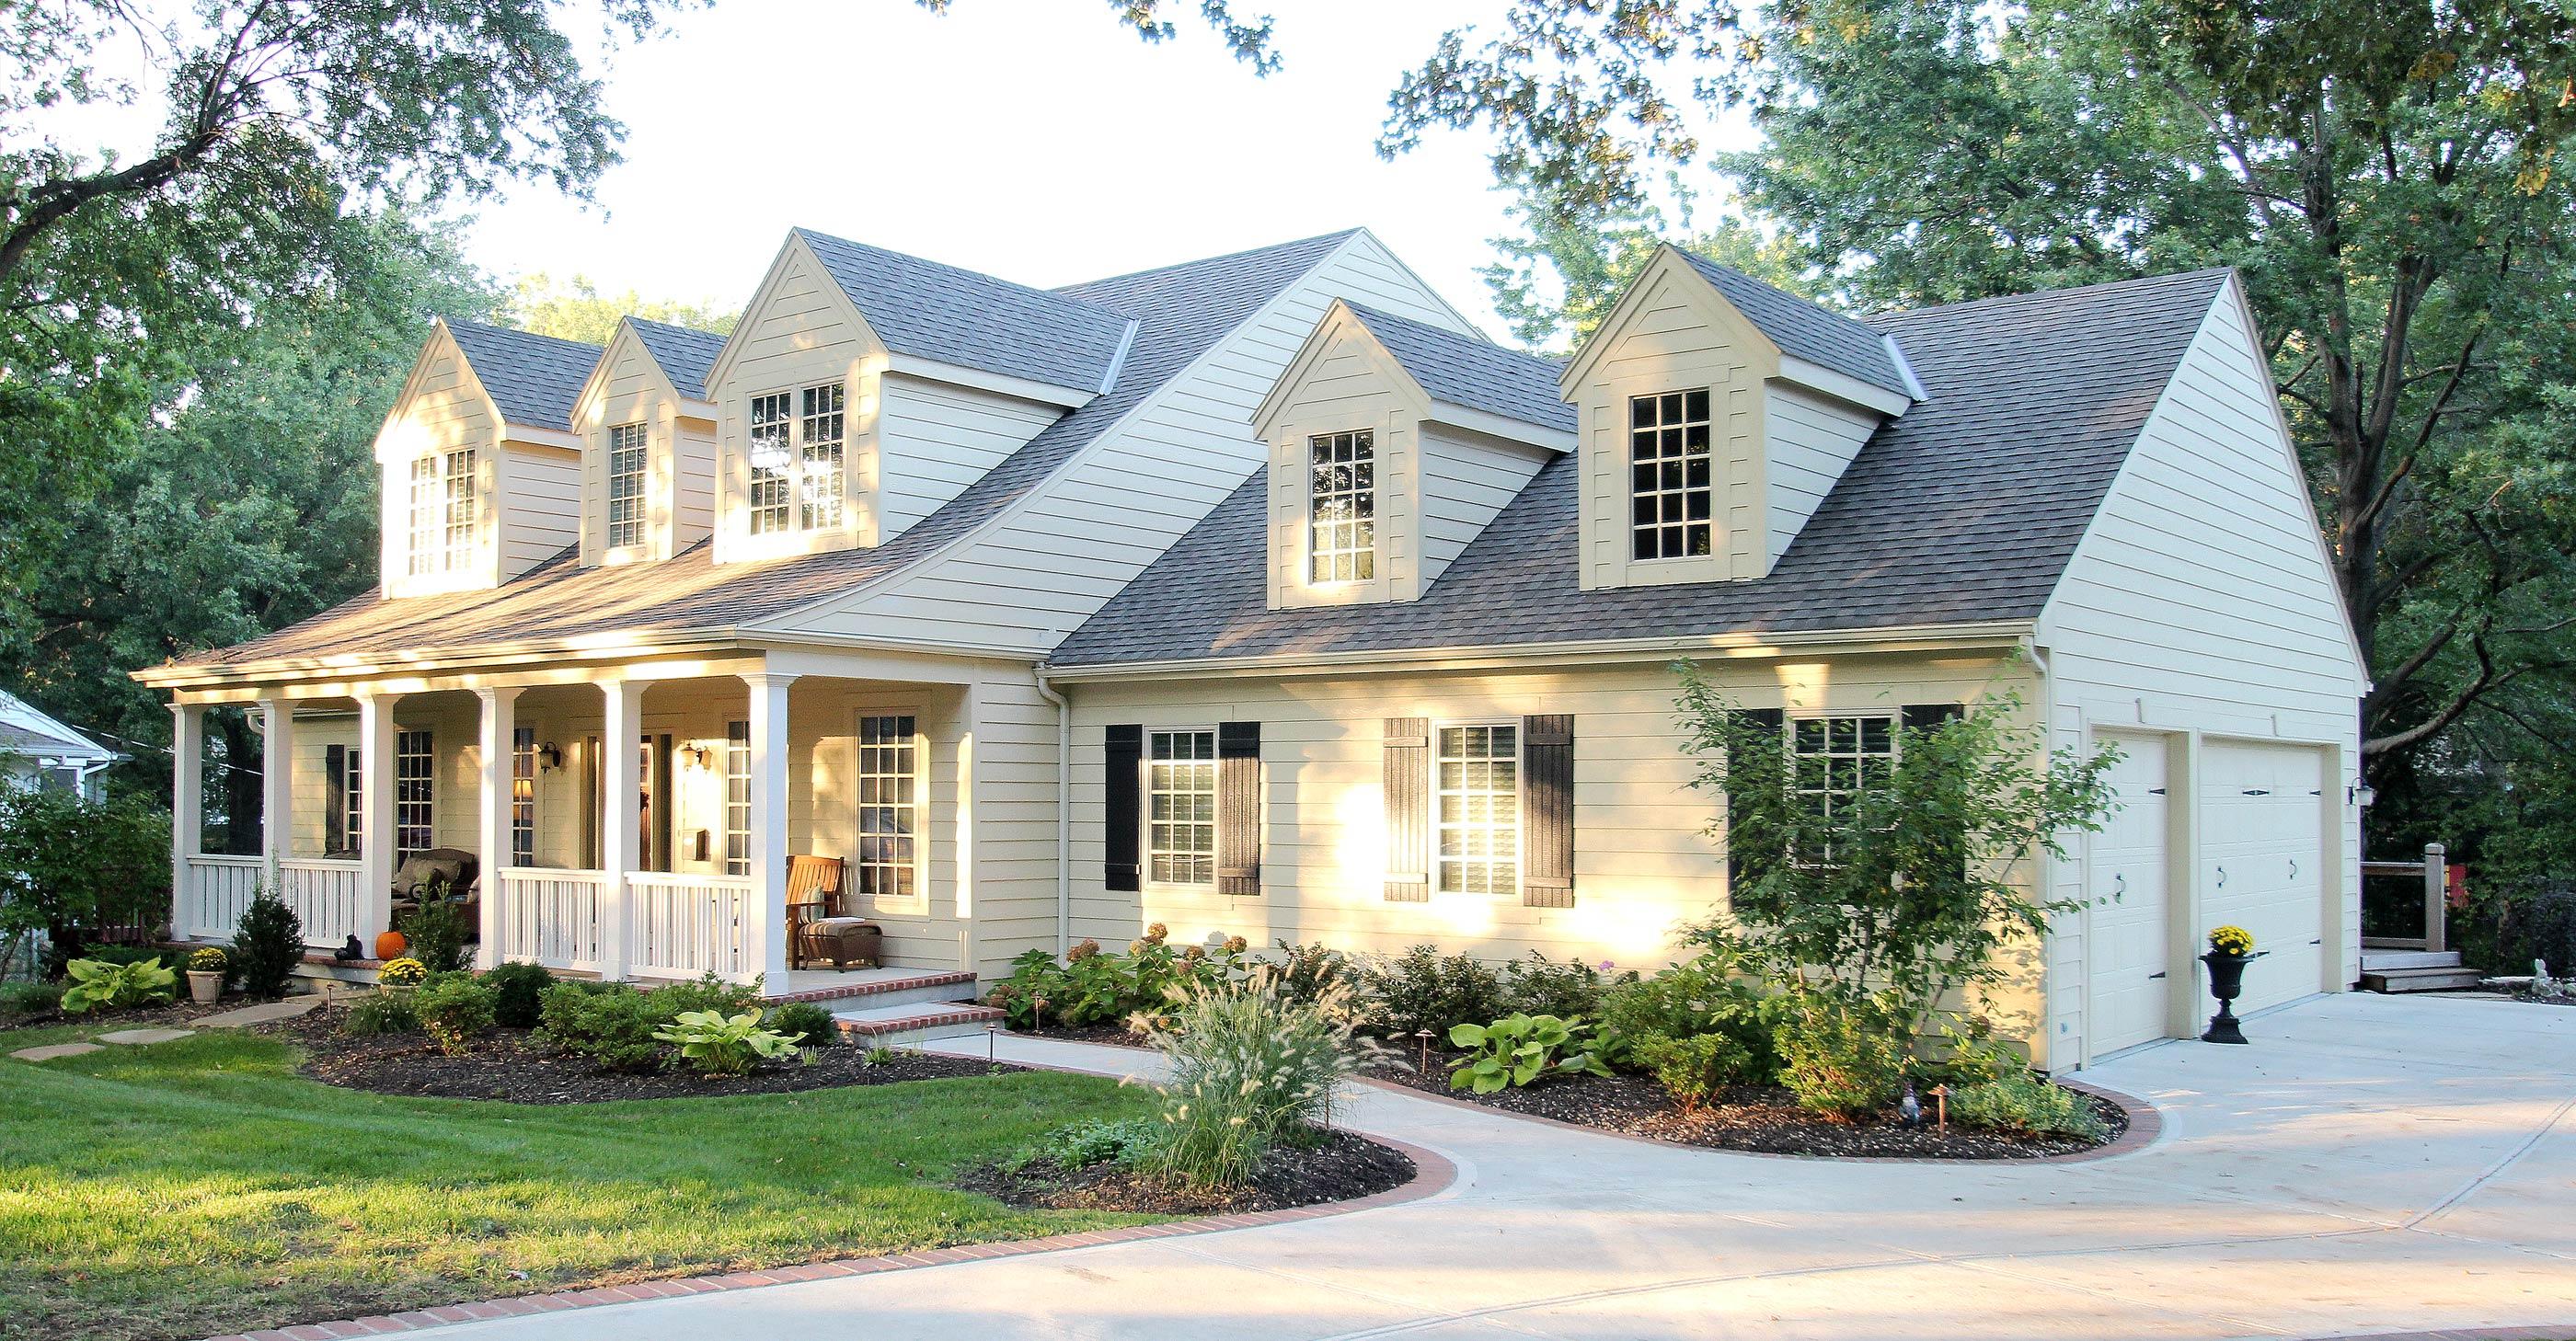 Mack colt homes contact us for Custom designed homes